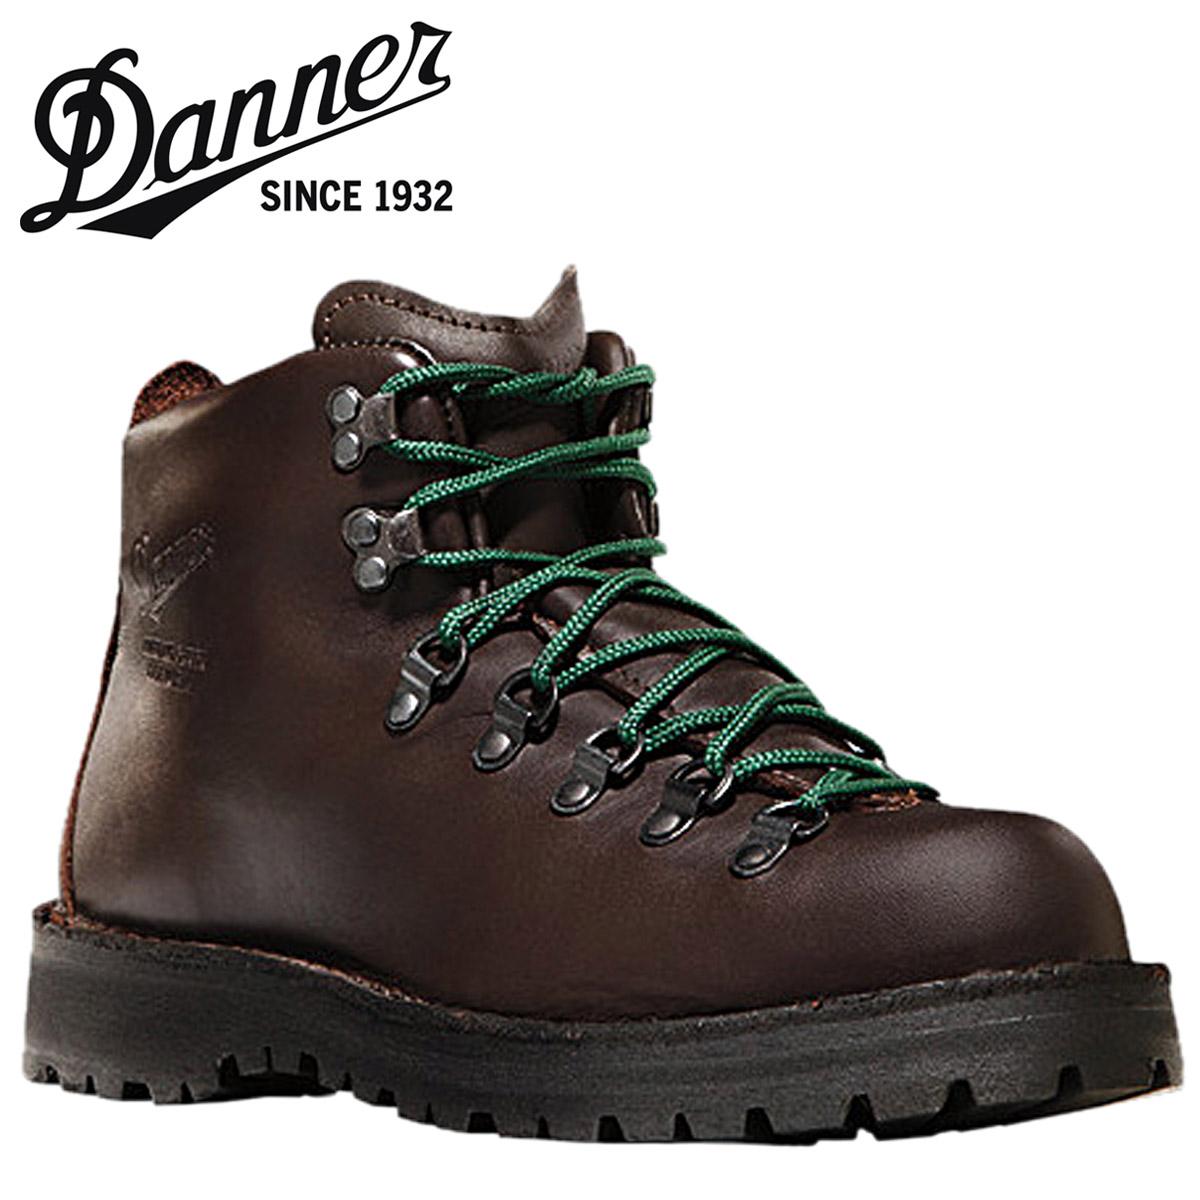 Sneak Online Shop Danner Danner Mountain Light Boots